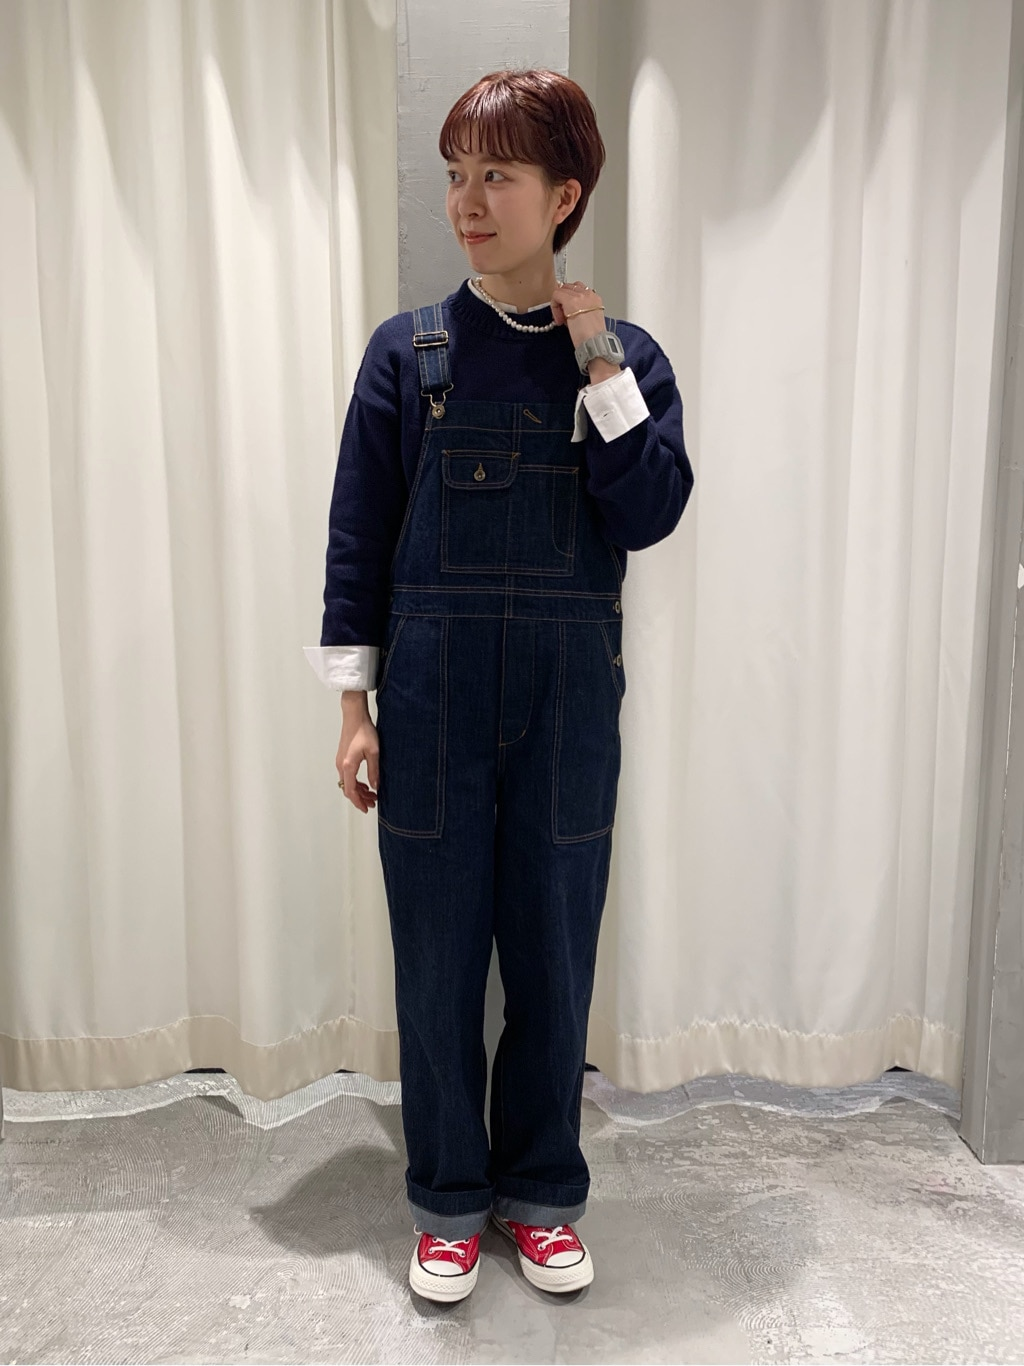 - CHILD WOMAN CHILD WOMAN , PAR ICI ルミネ横浜 身長:158cm 2020.12.15